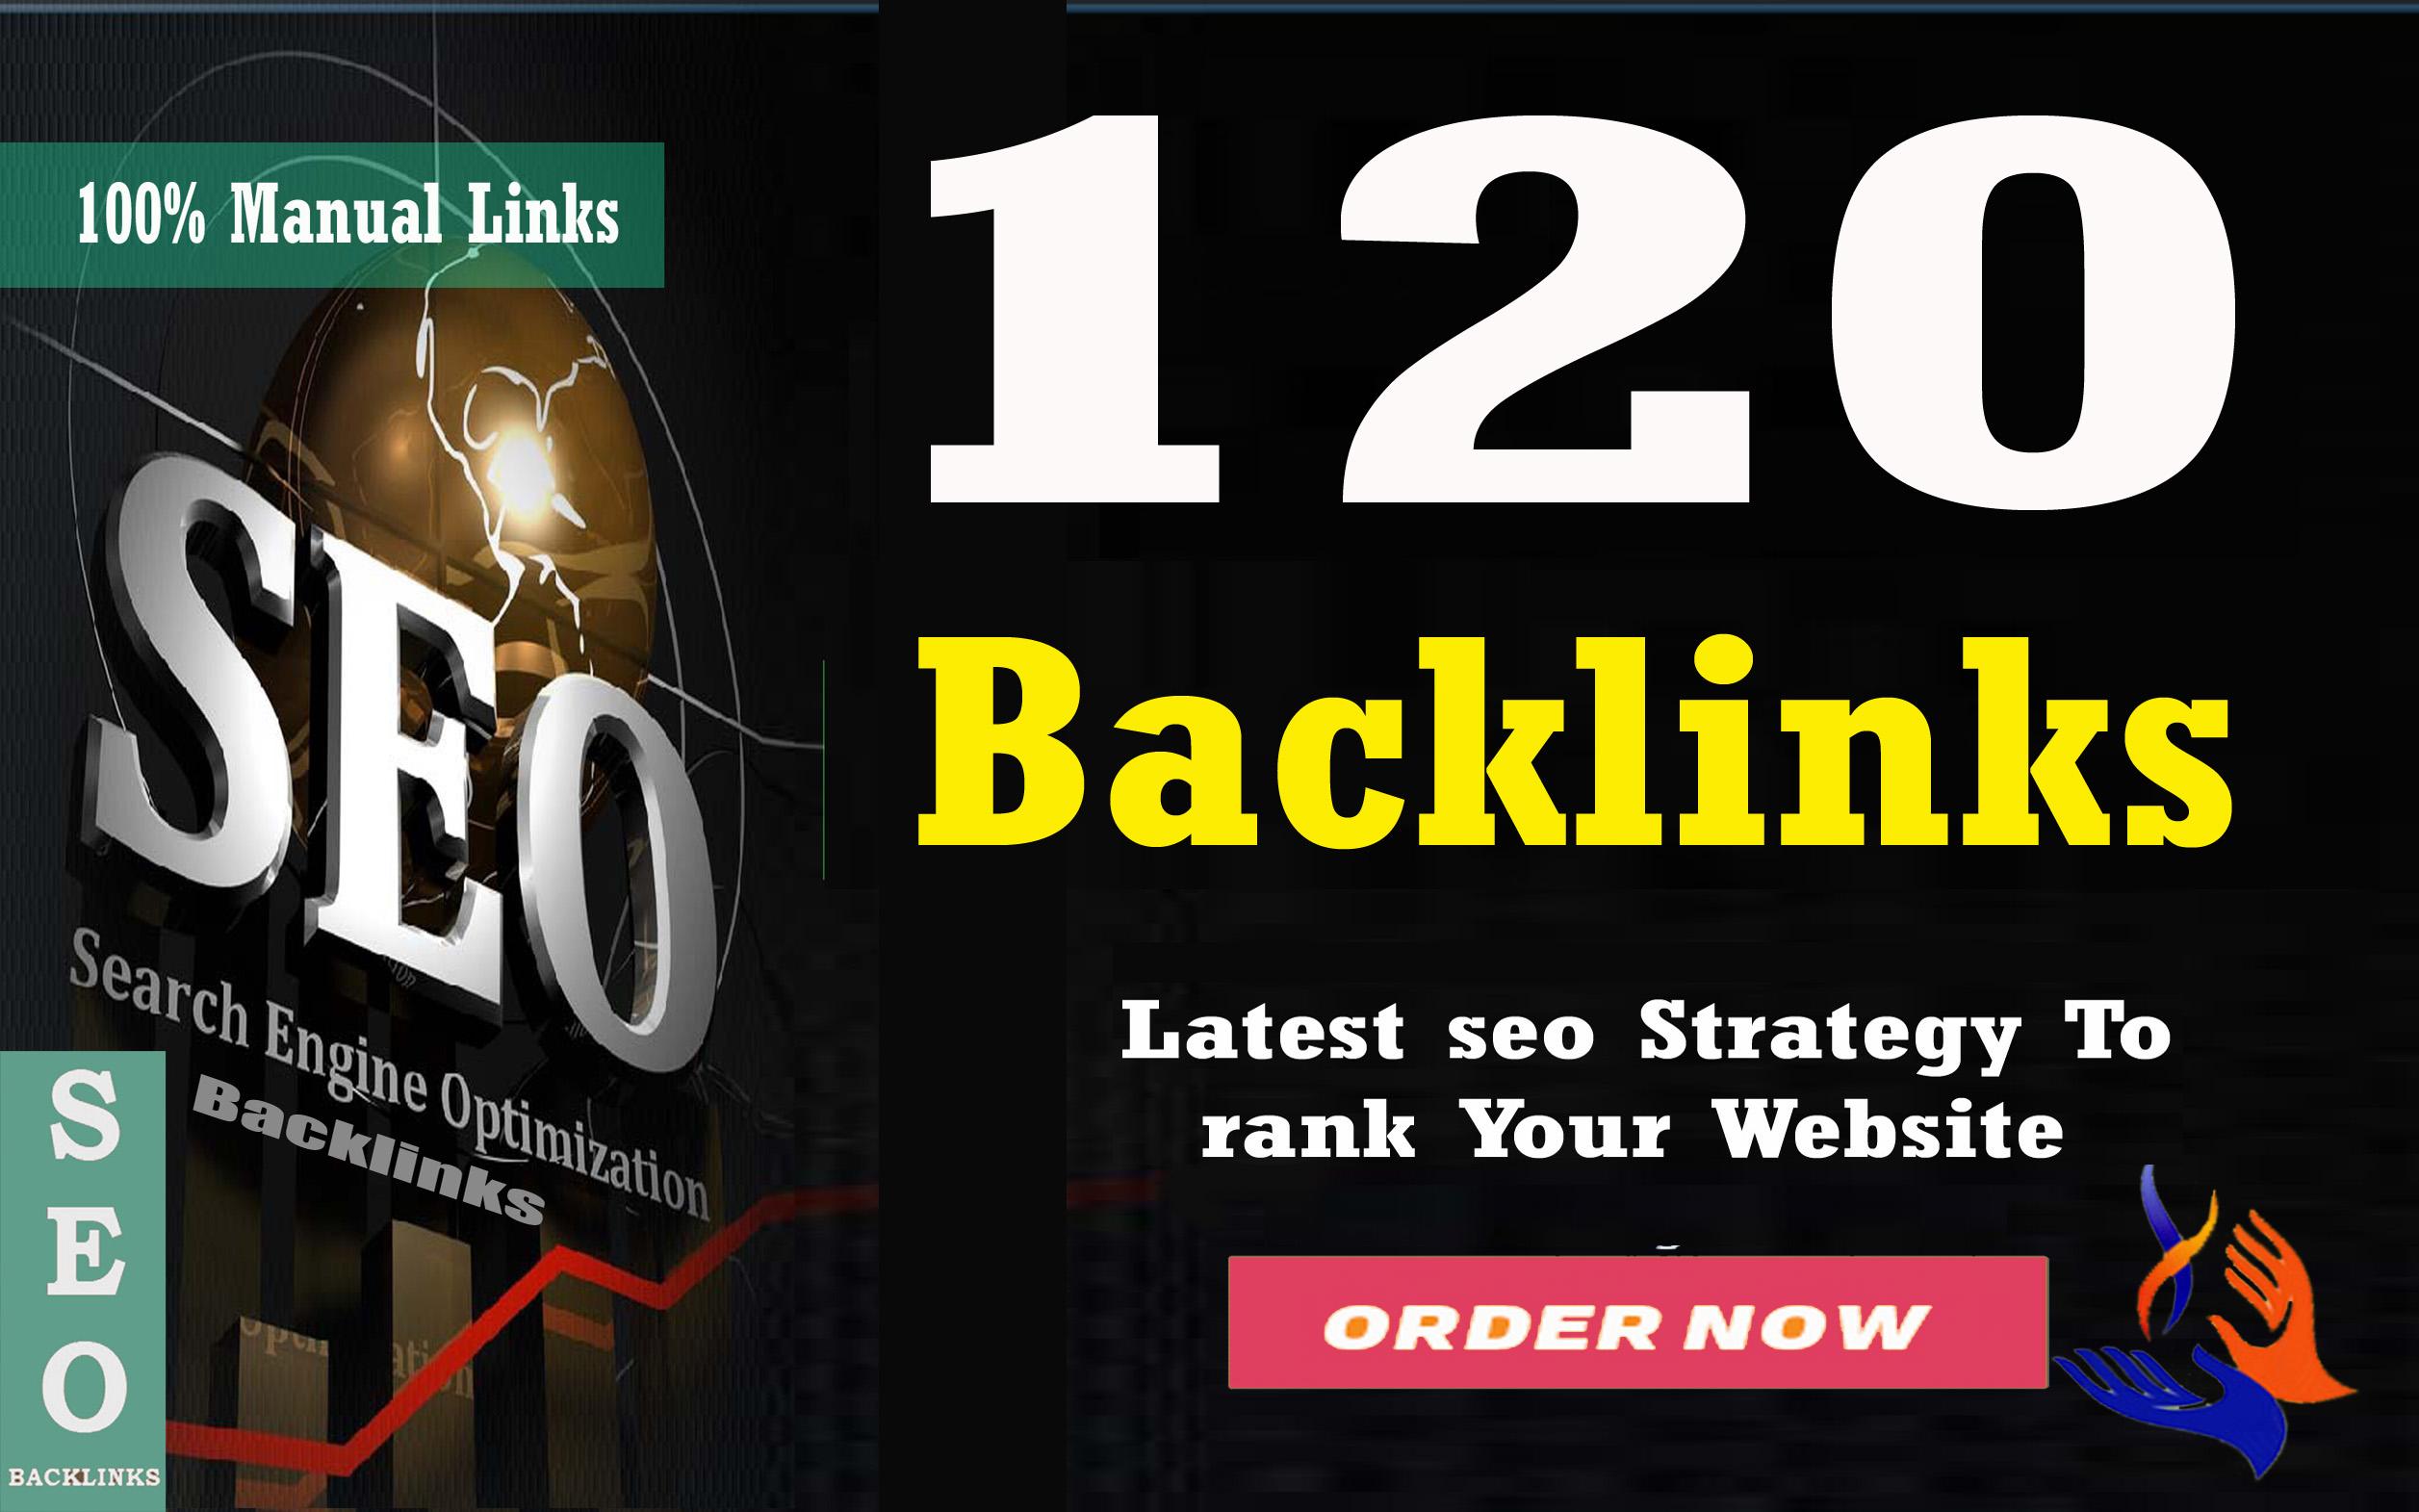 Build 120 HomePage PBN Backlinks All Dofollow High Quality Backlinks